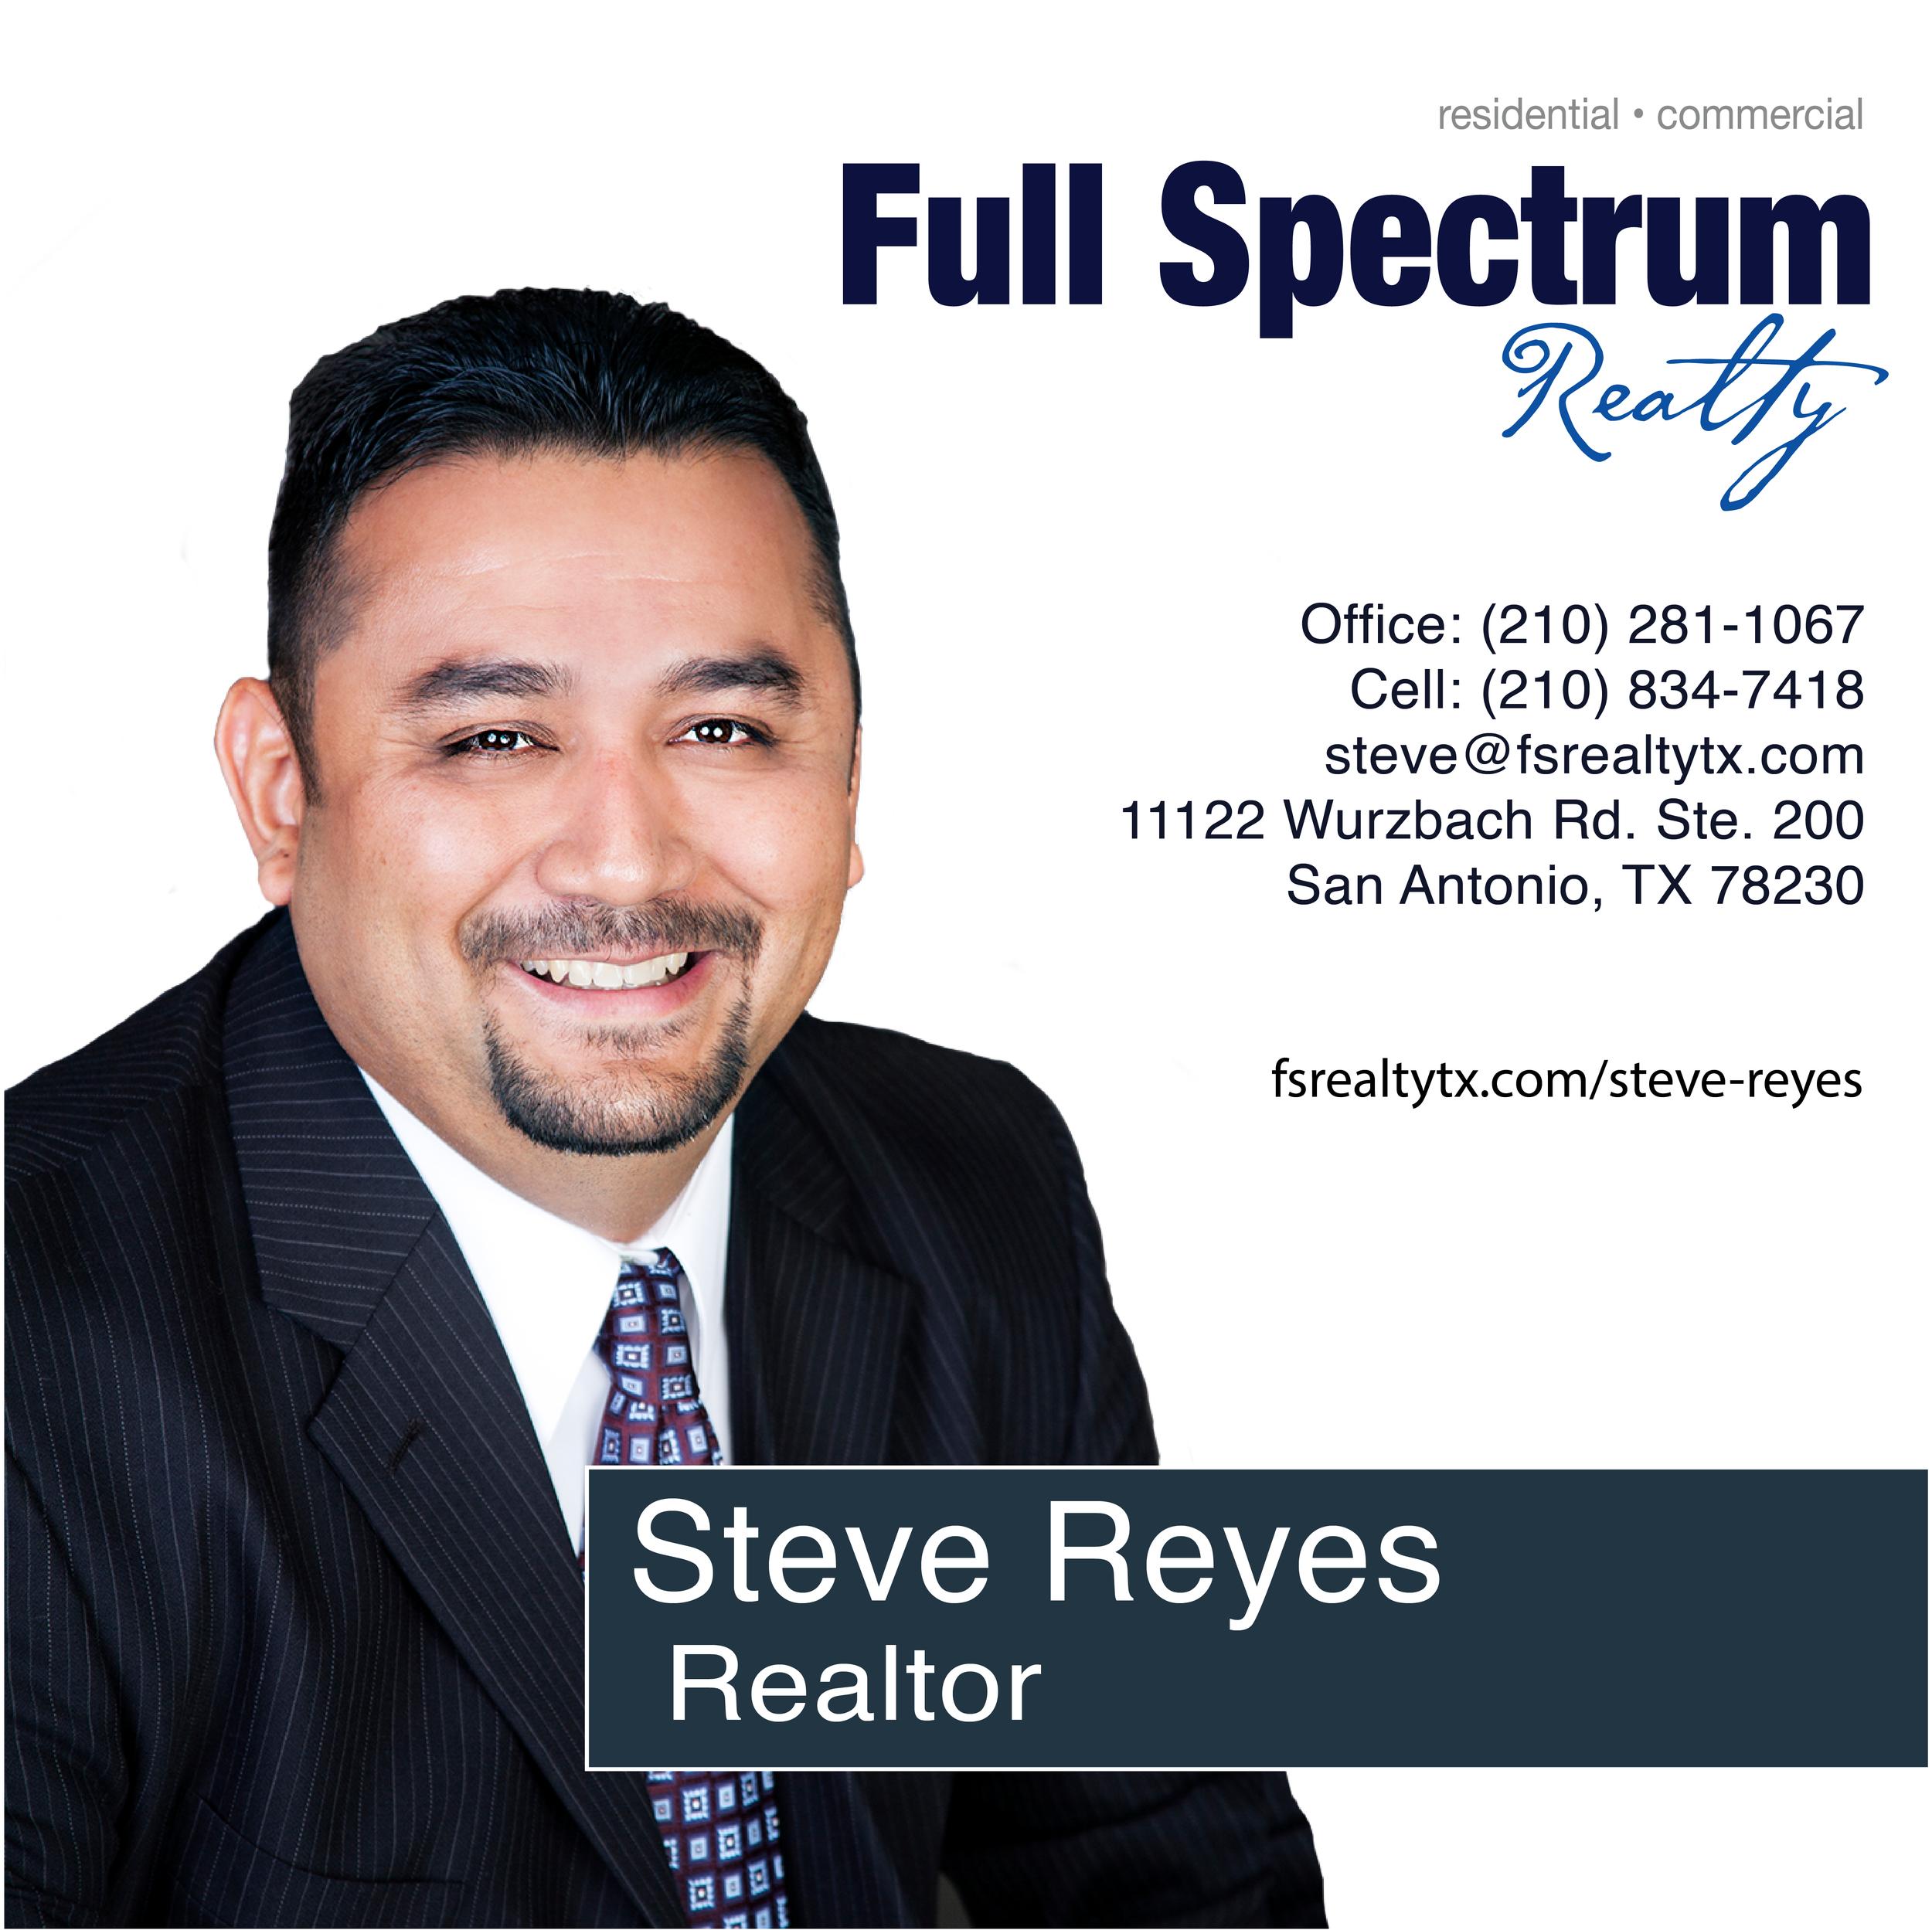 Steve Reyes Realtor